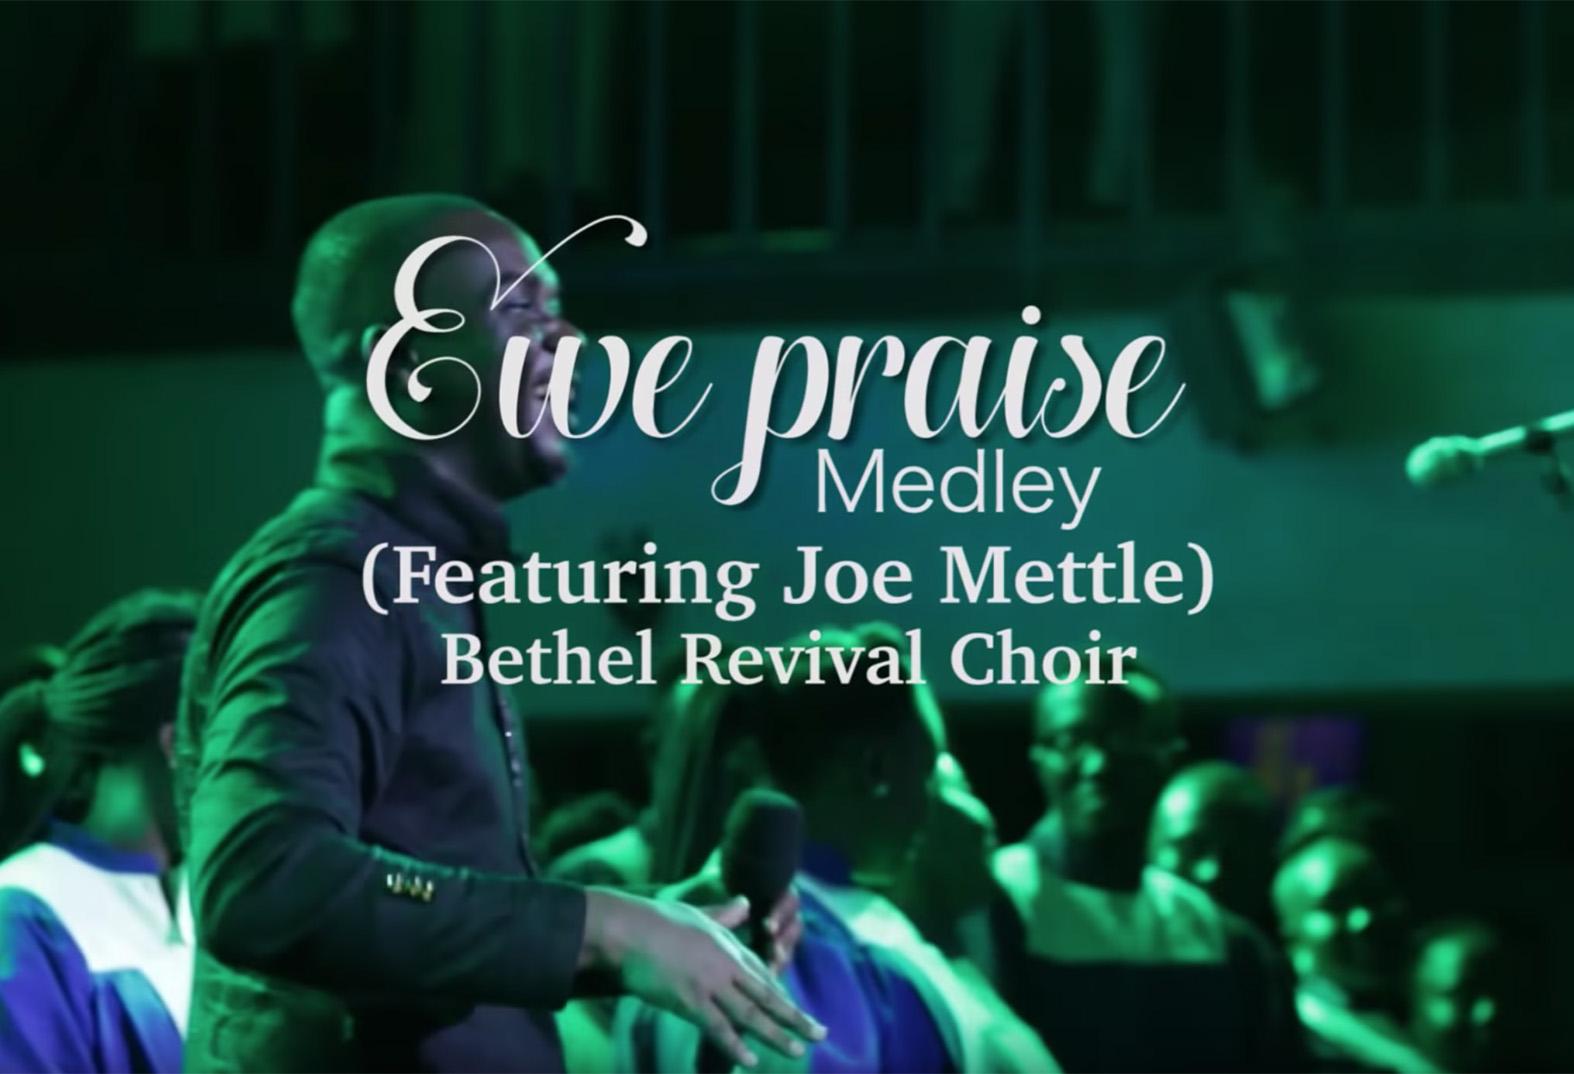 Vovome (Ewe Praise Medley) by Joe Mettle feat. Bethel Revival Choir